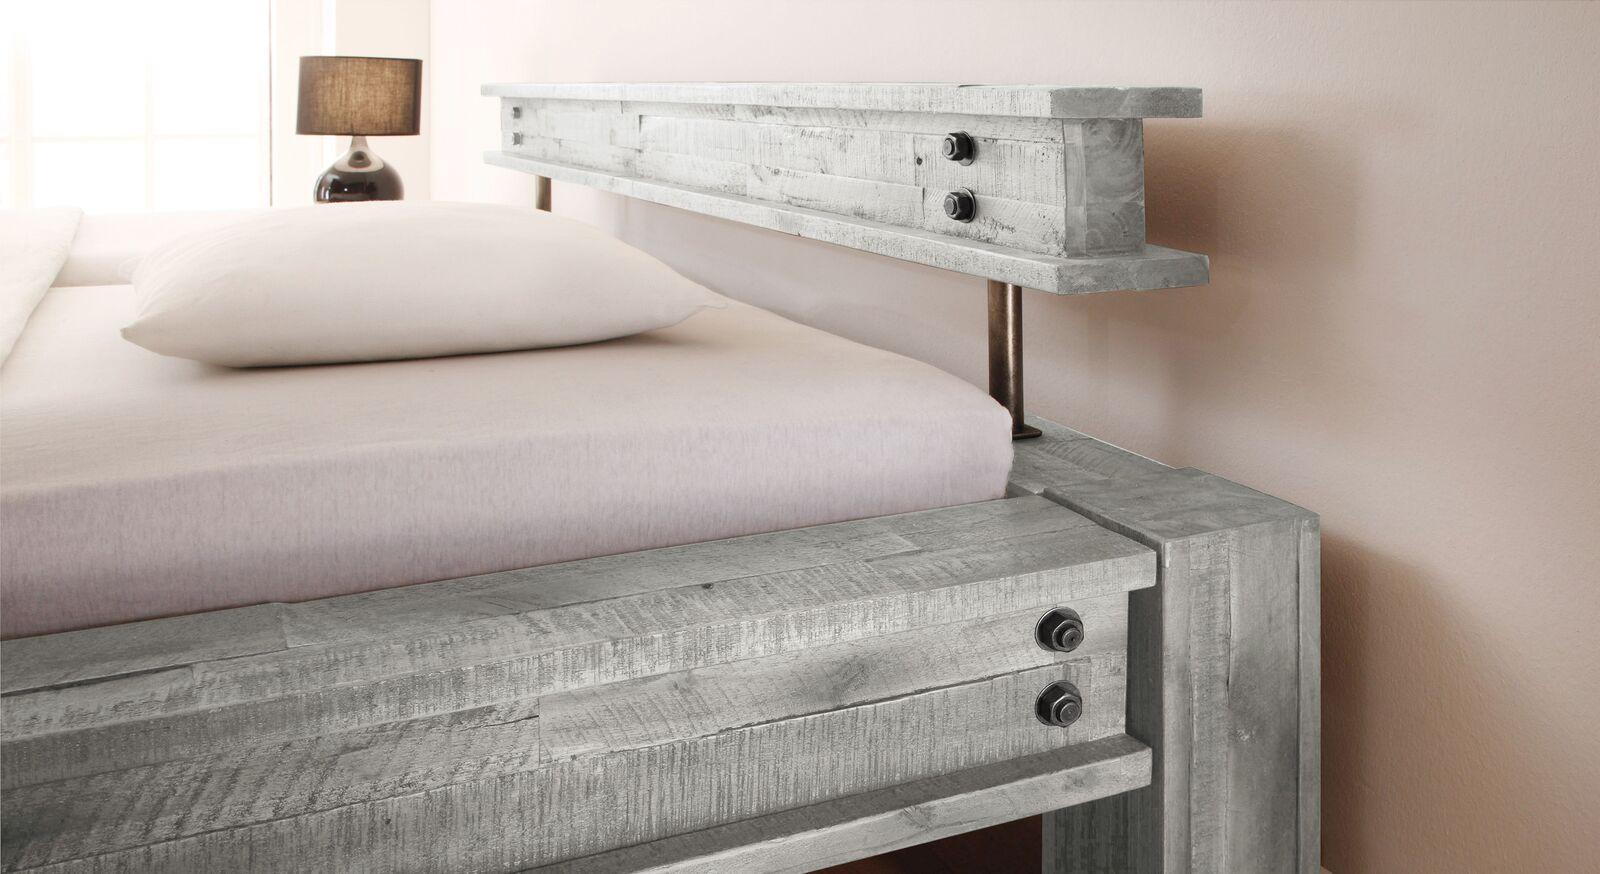 Modernes Bett Cekin mit niedrigem Kopfteil